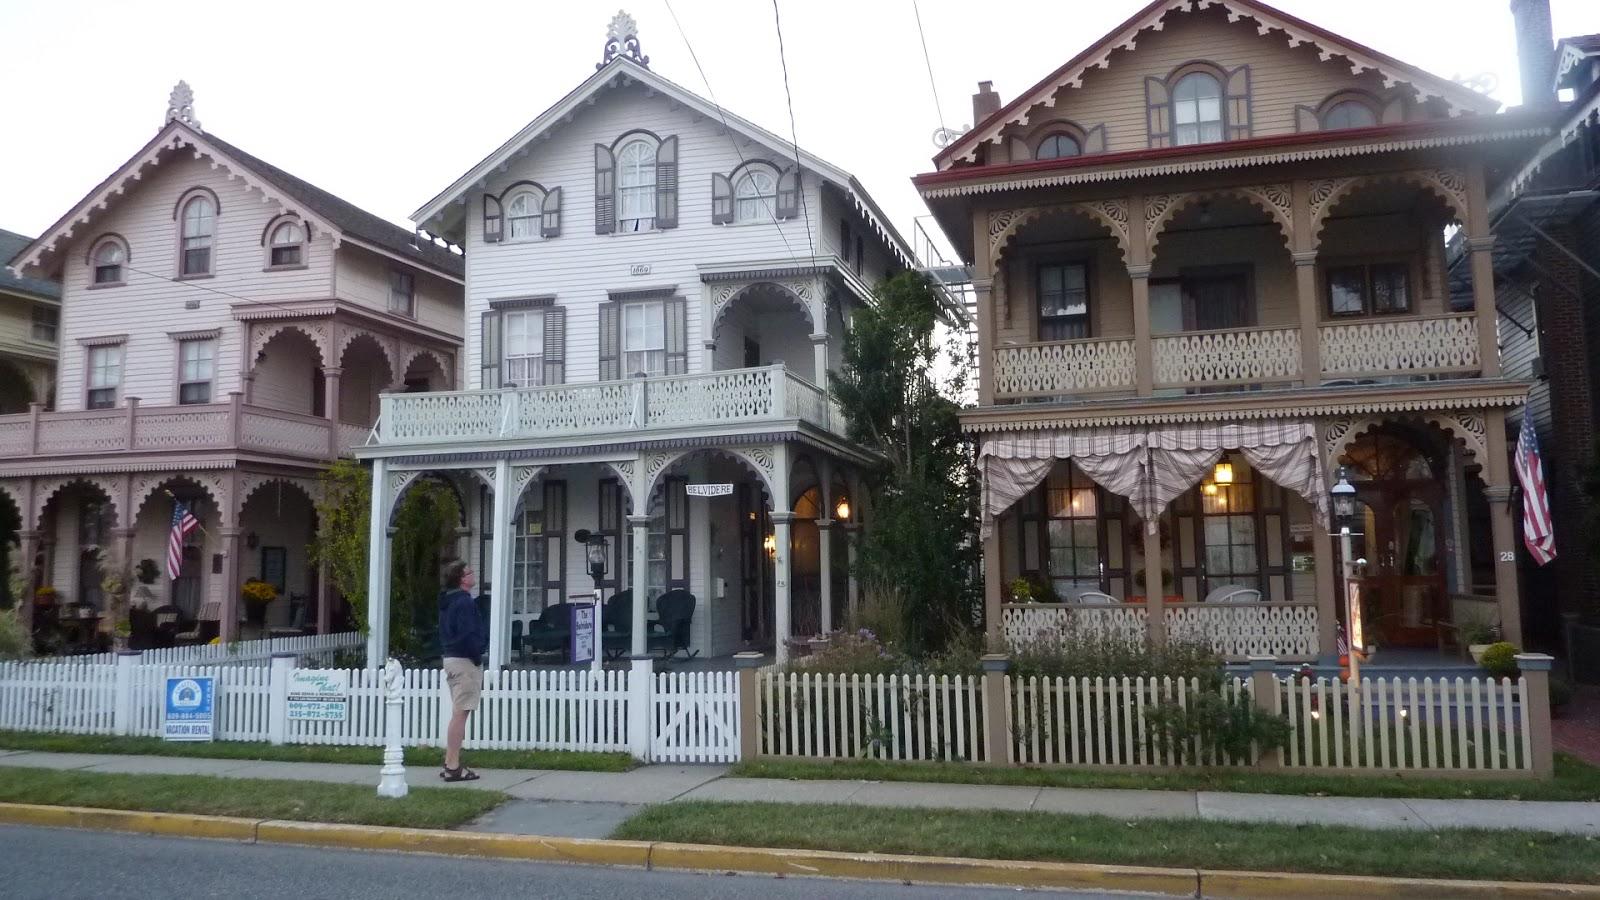 Remarkable Anges Dollhouse Choosing The Exterior Color Scheme Largest Home Design Picture Inspirations Pitcheantrous